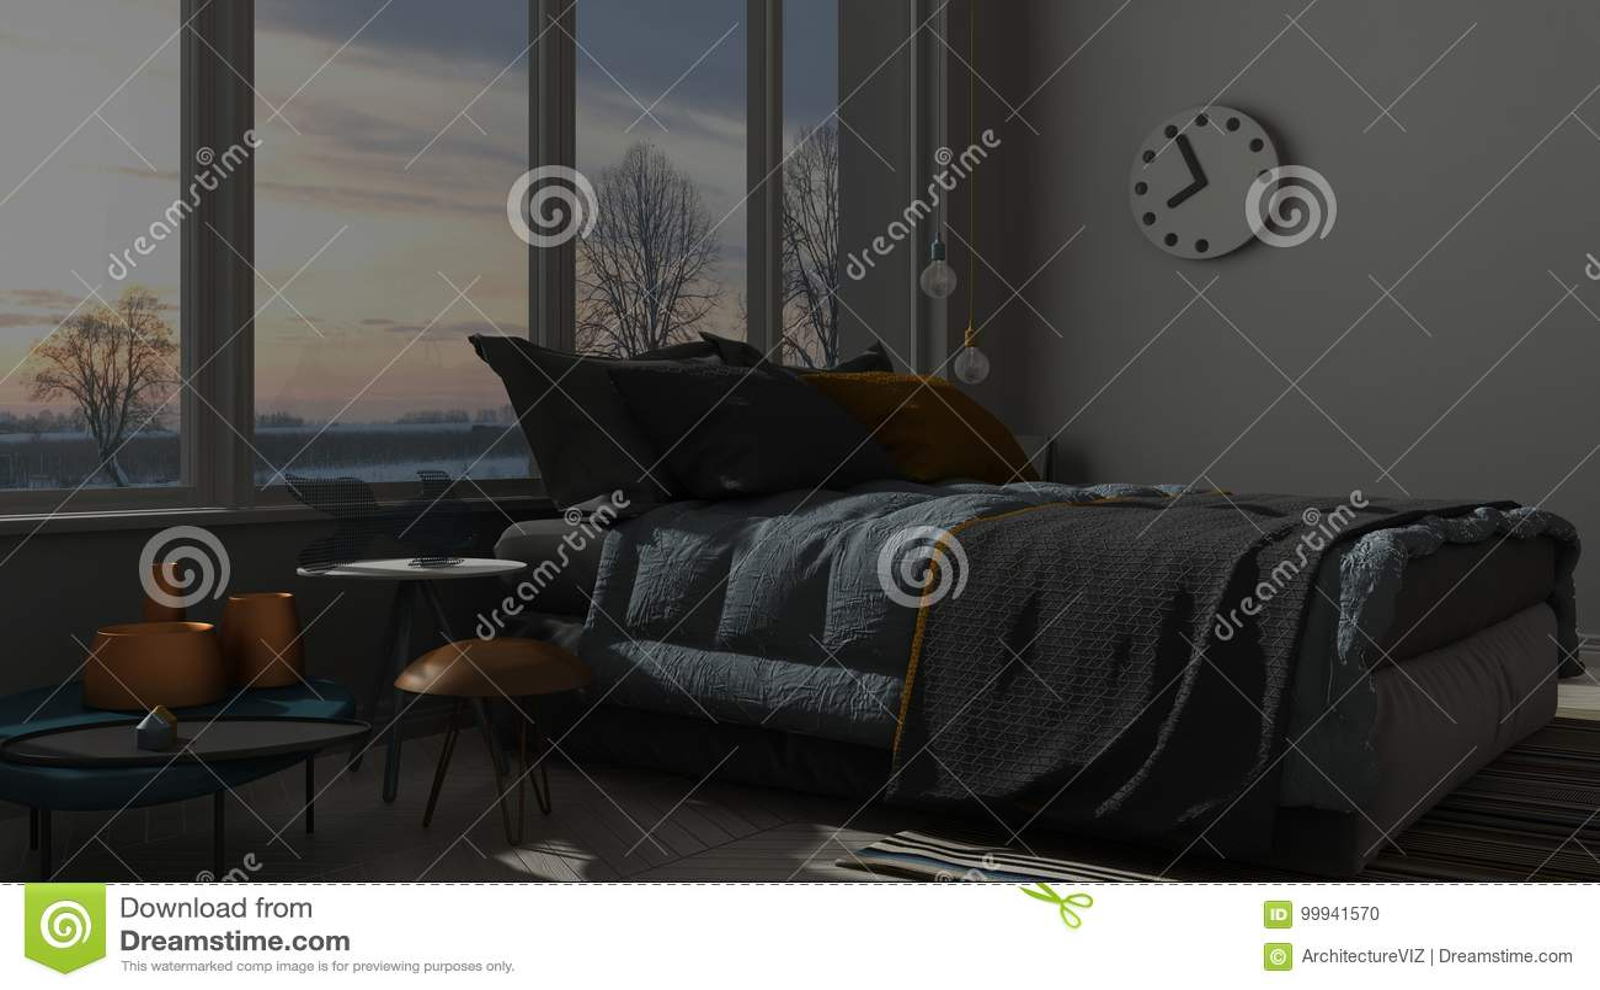 Colored Modern Blue And Orange Bedroom With Big Panoramic Window Sunset Sunrise Night Scene Architecture Minimalist Interior Design